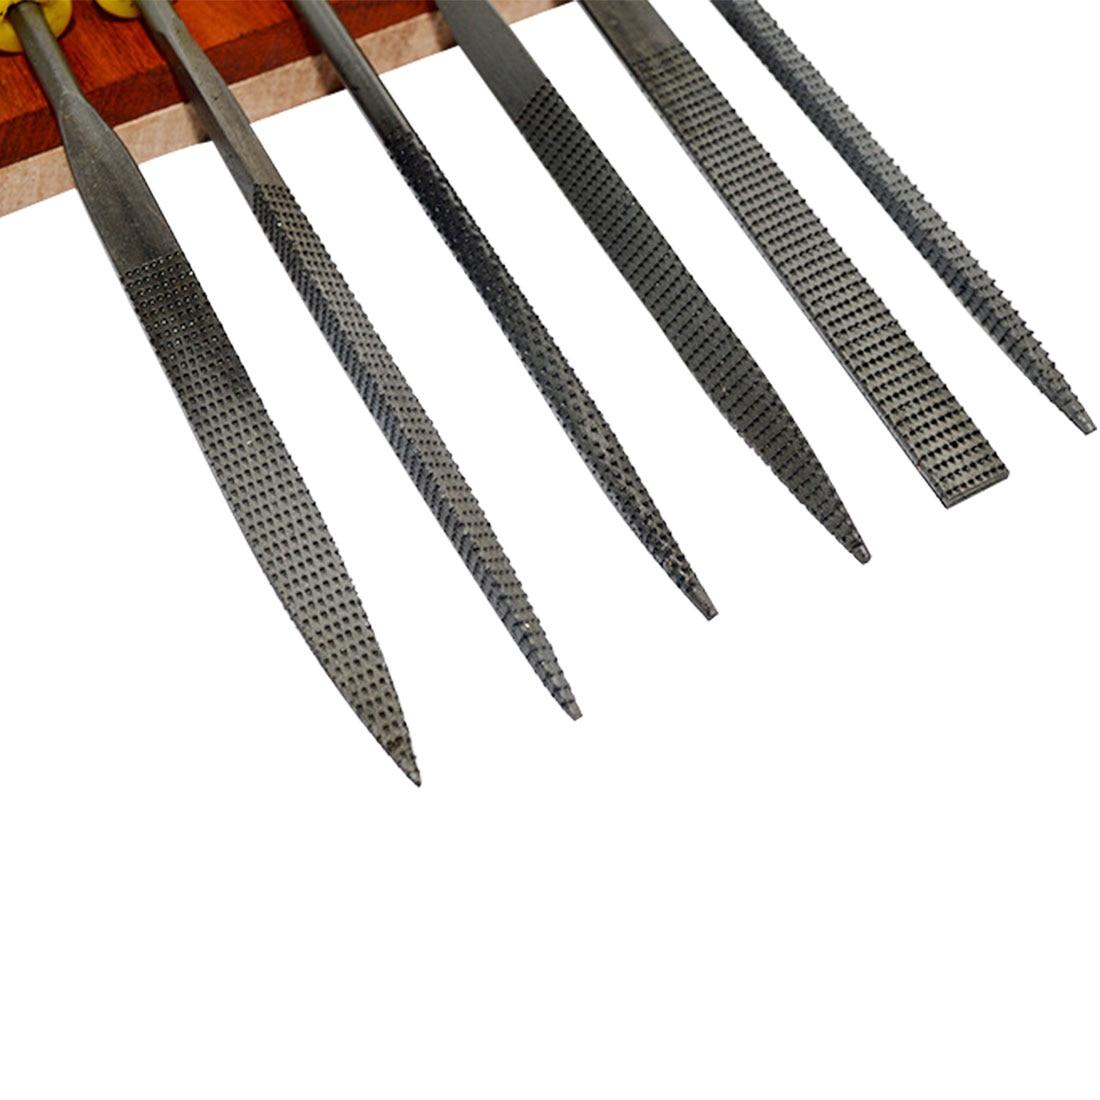 Купить с кэшбэком 6pcs Mini Metal Filing  Rasp Diamond Needle File Wood Grinding Tools Hand Woodworking Files Tool 140x3mm